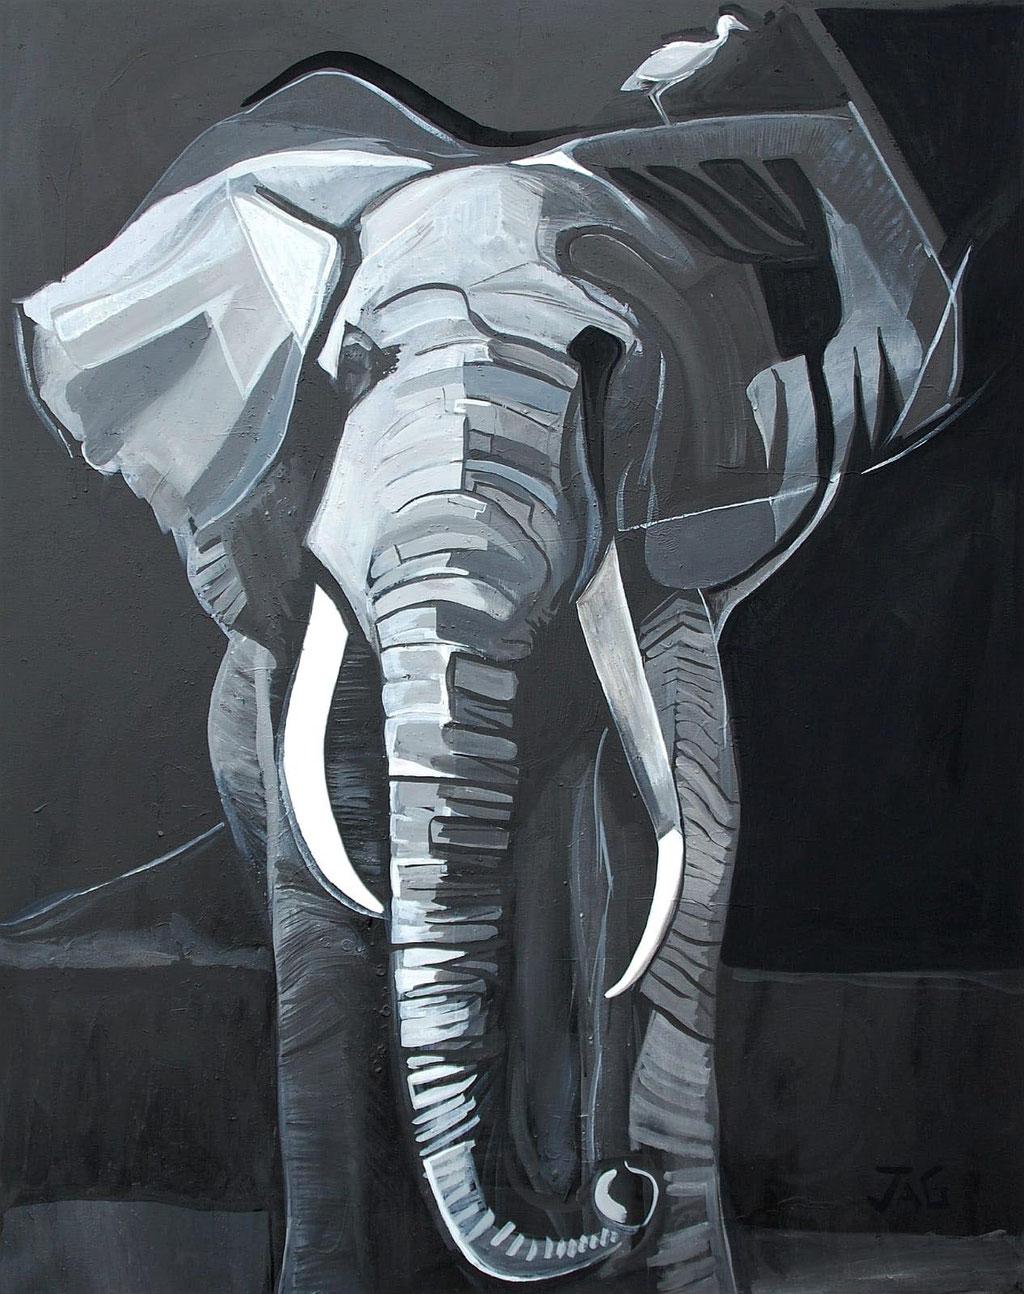 'Eleanor' acrylic on canvas, 2020, 123 x 153cm - SOLD